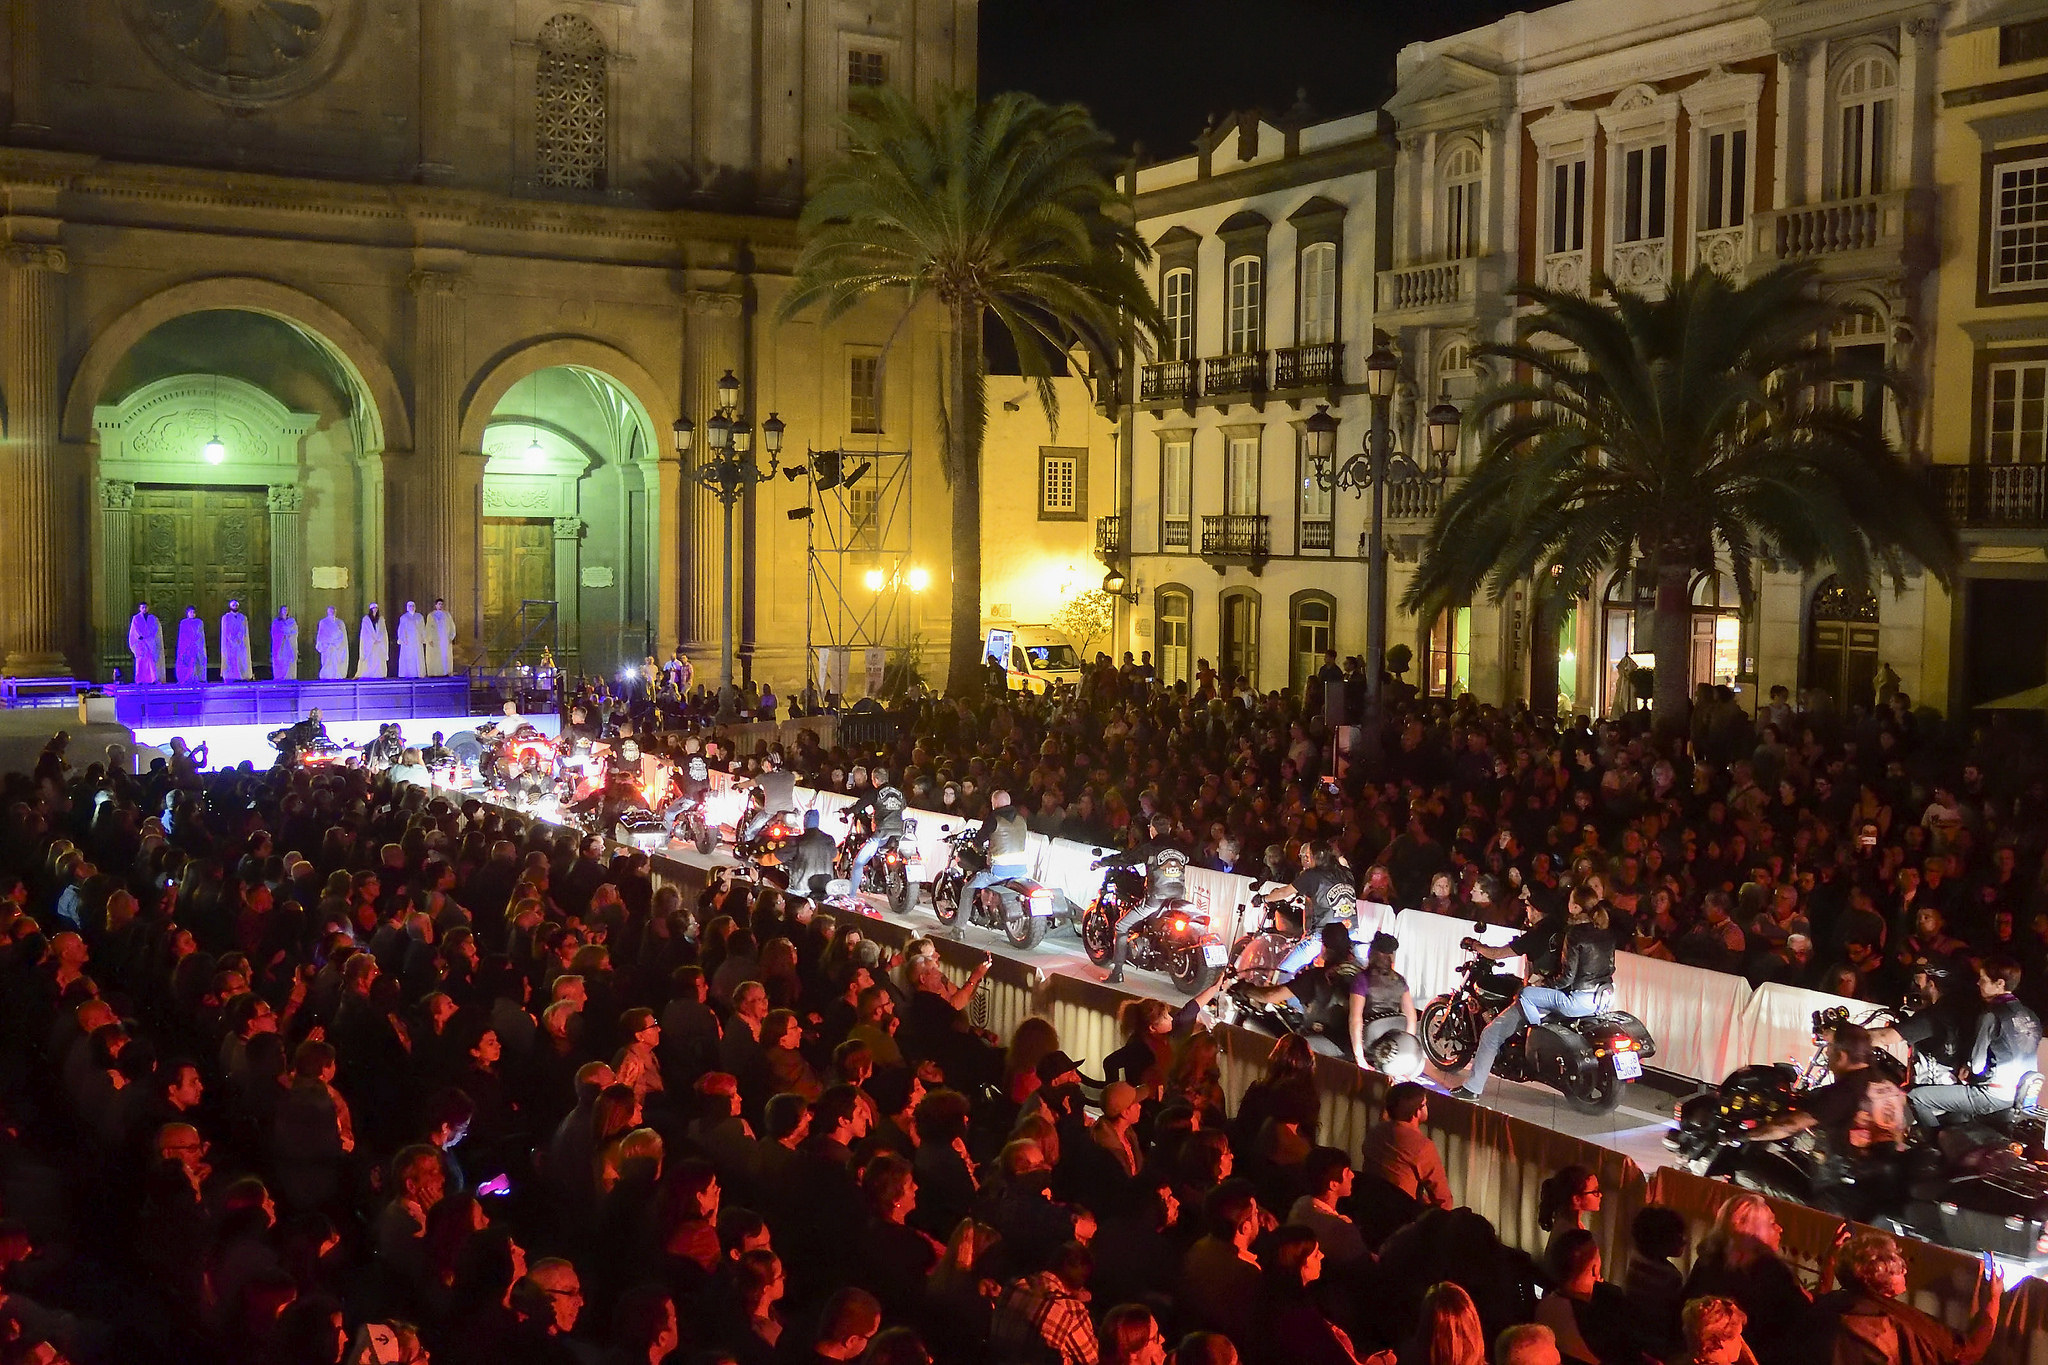 D. Juan tenorio vegueta - Cinco motivos para viajar este otoño a Las Palmas de Gran Canaria